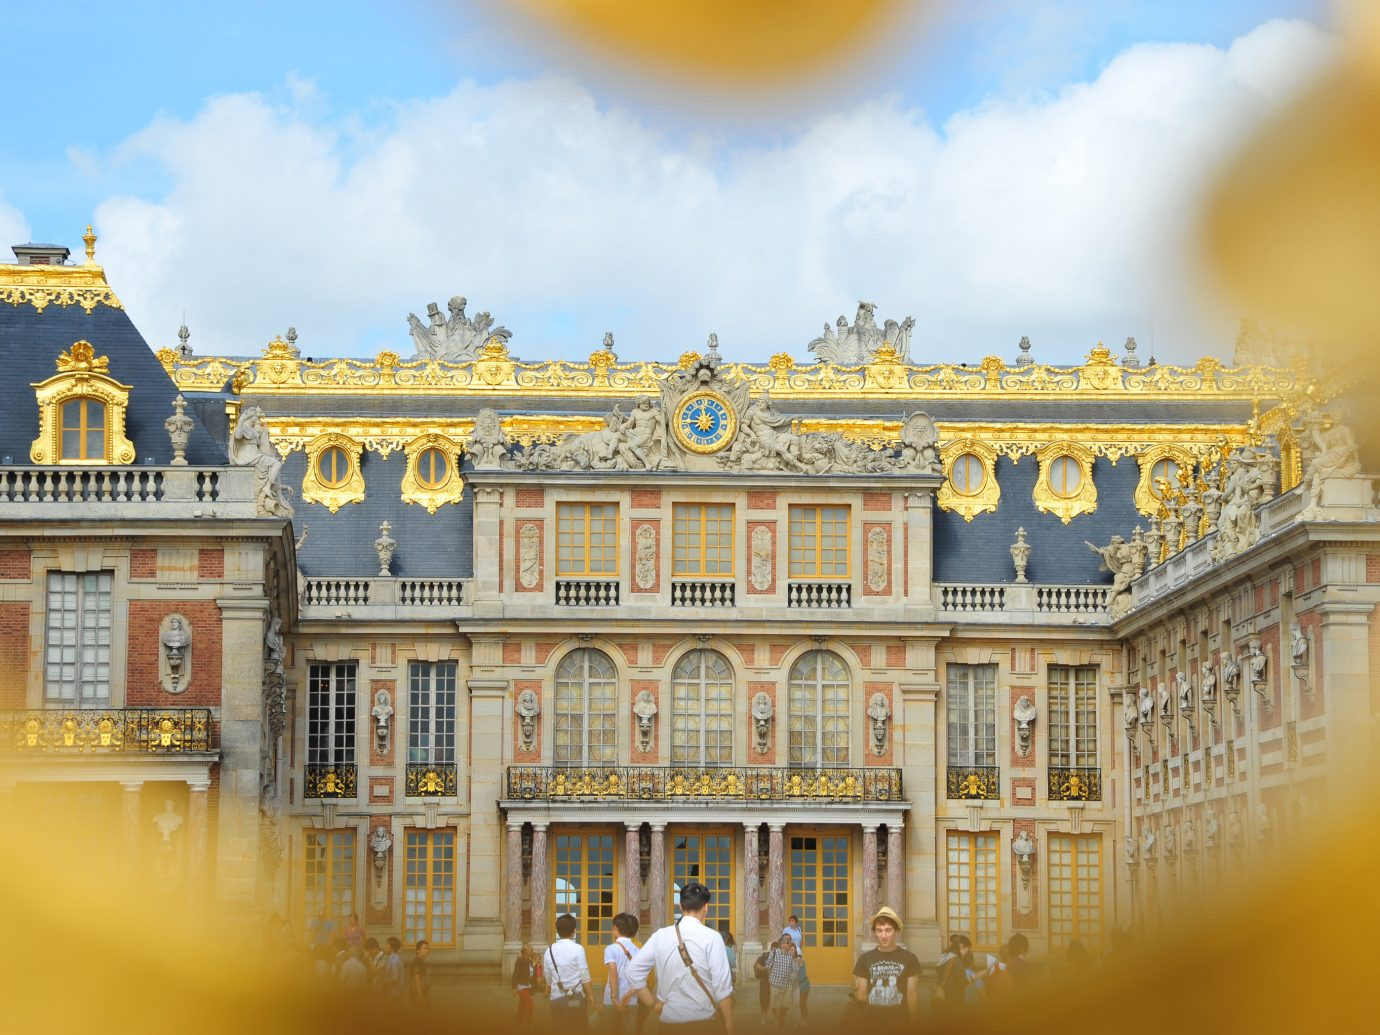 Romance Trip Ideas yellow landmark palace building house Architecture reflection tourism estate cityscape facade château bright